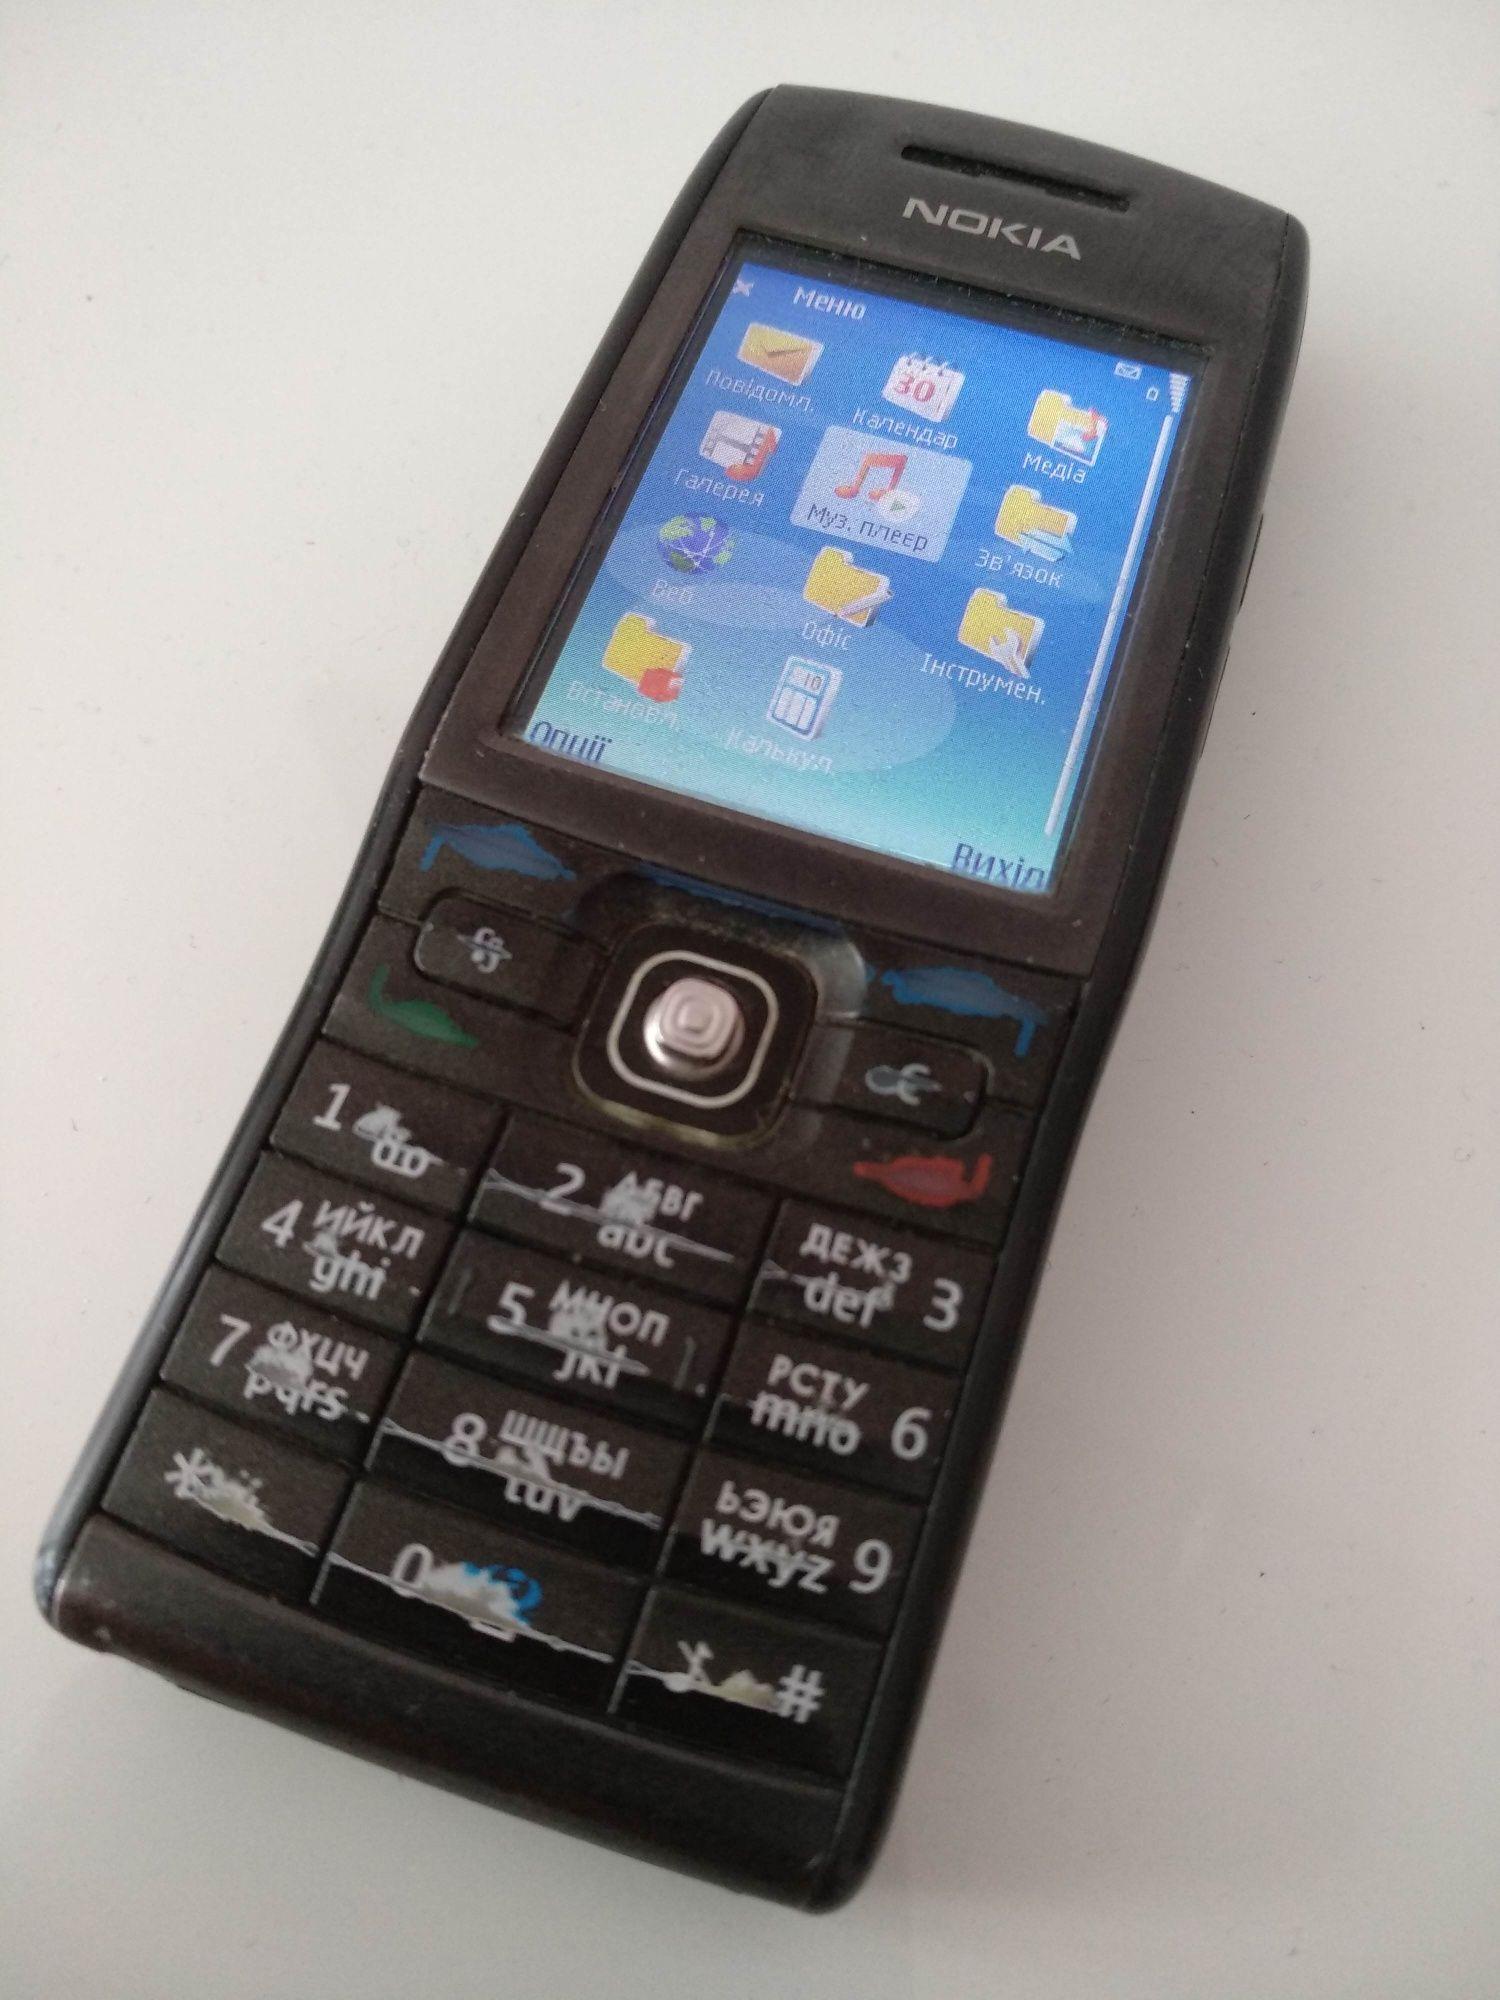 Nokia E50-1, Нокіа, телефон, Symbian, повний комплект, з навушниками